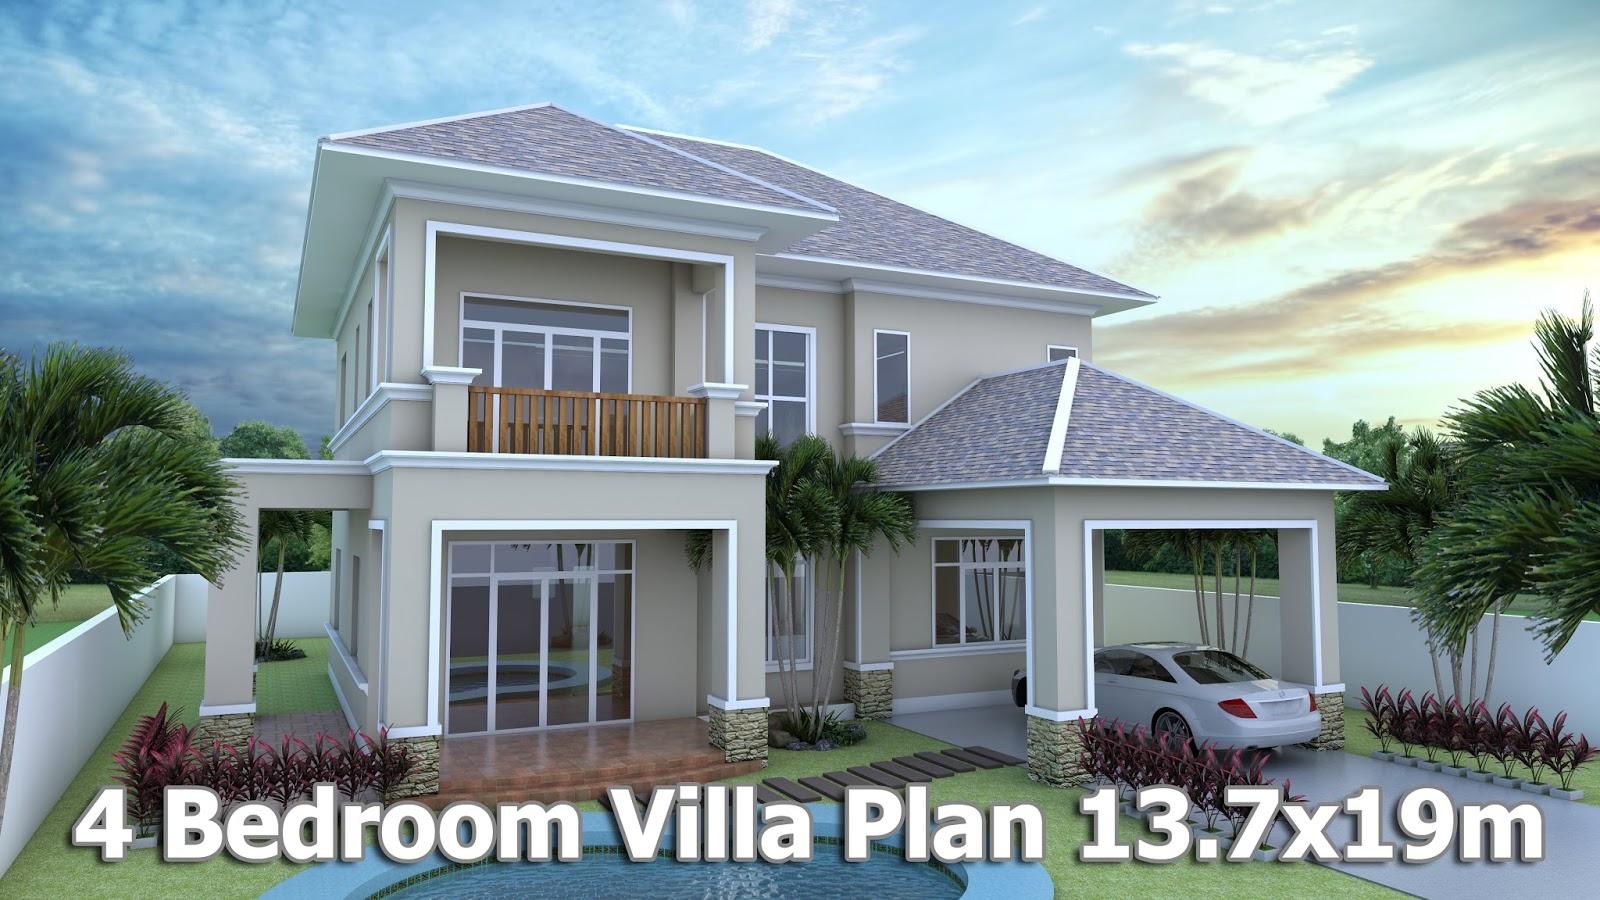 Home Design 3d Sketchup Villa Plan 137x19m SaM ArchitecT